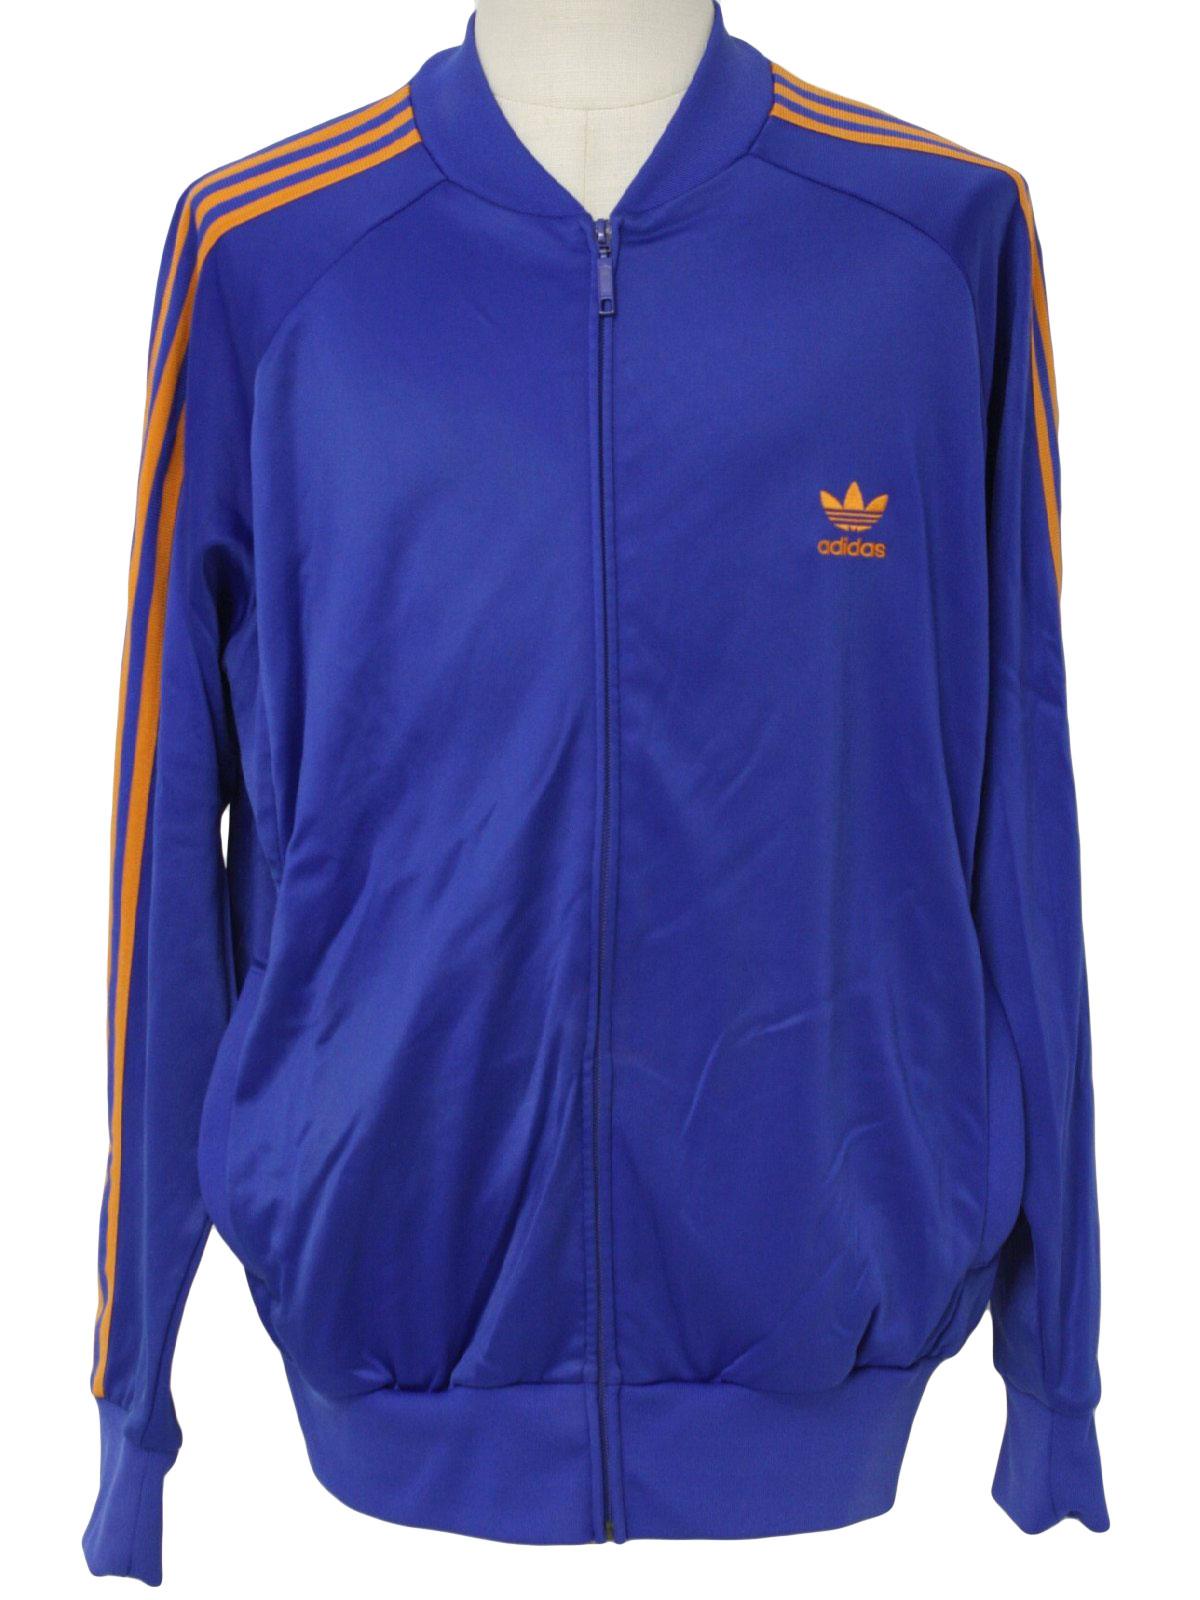 Vintage Adidas 80 S Jacket 80s Adidas Mens Blue And Orange Nylon